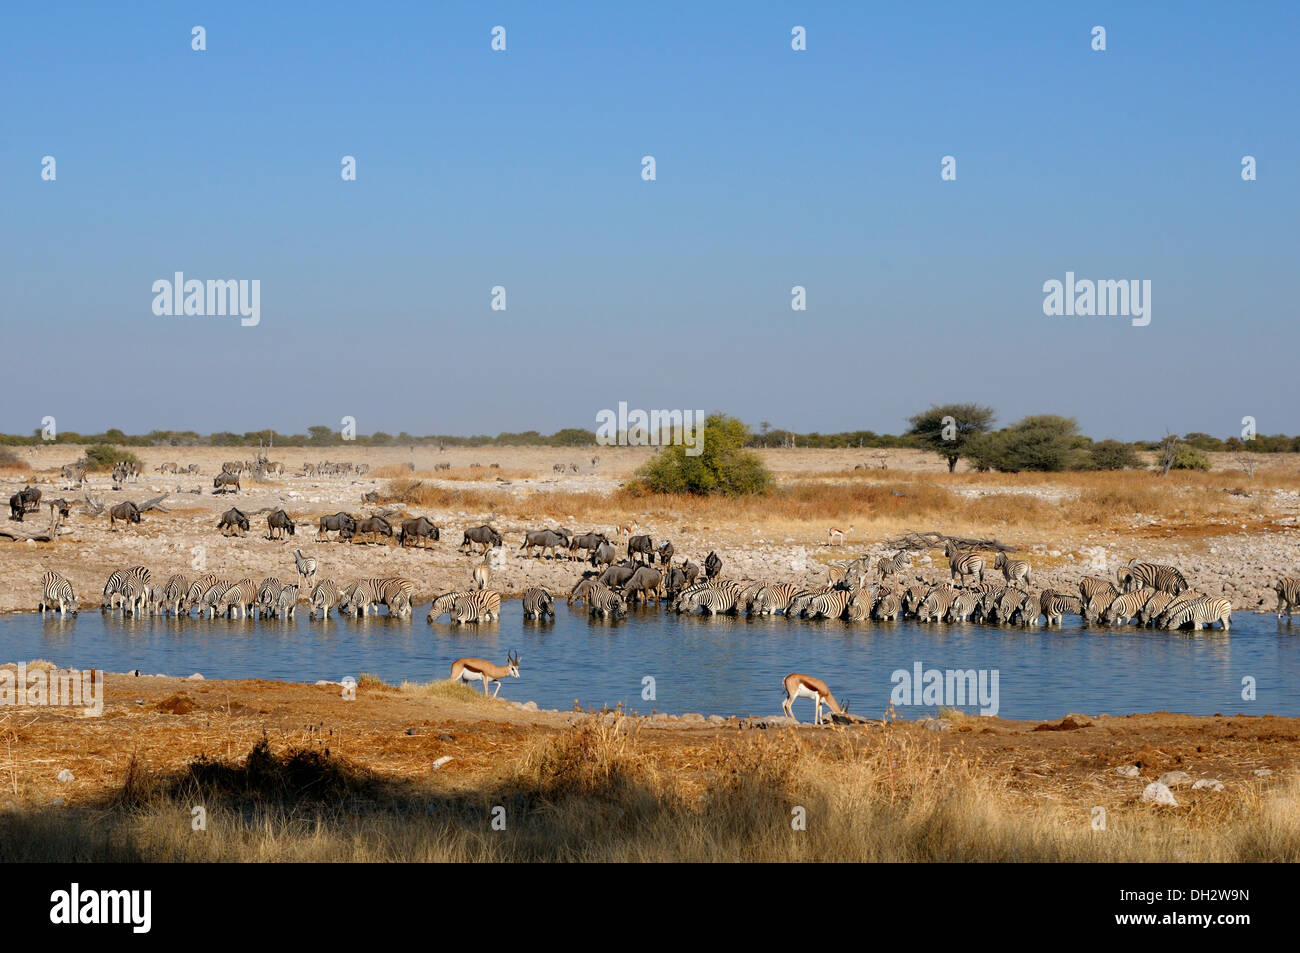 Blue Wildebeest, Zebra and Springbok drinking water at the Okaukeujo waterhole, Etosha National Park, Namibia - Stock Image